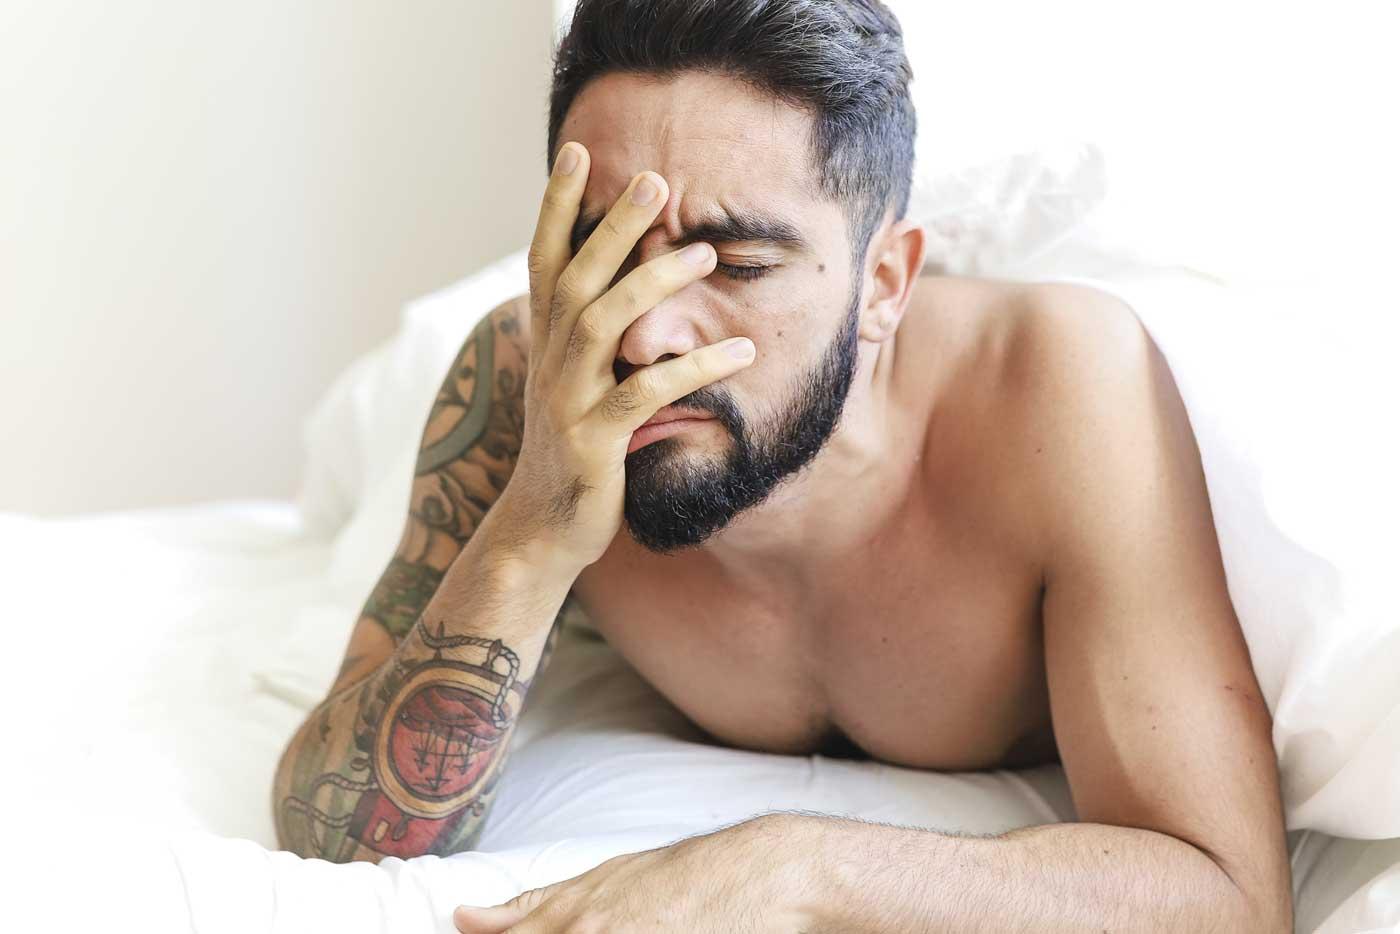 thyroid-treatment-denver-signs-symptoms-men